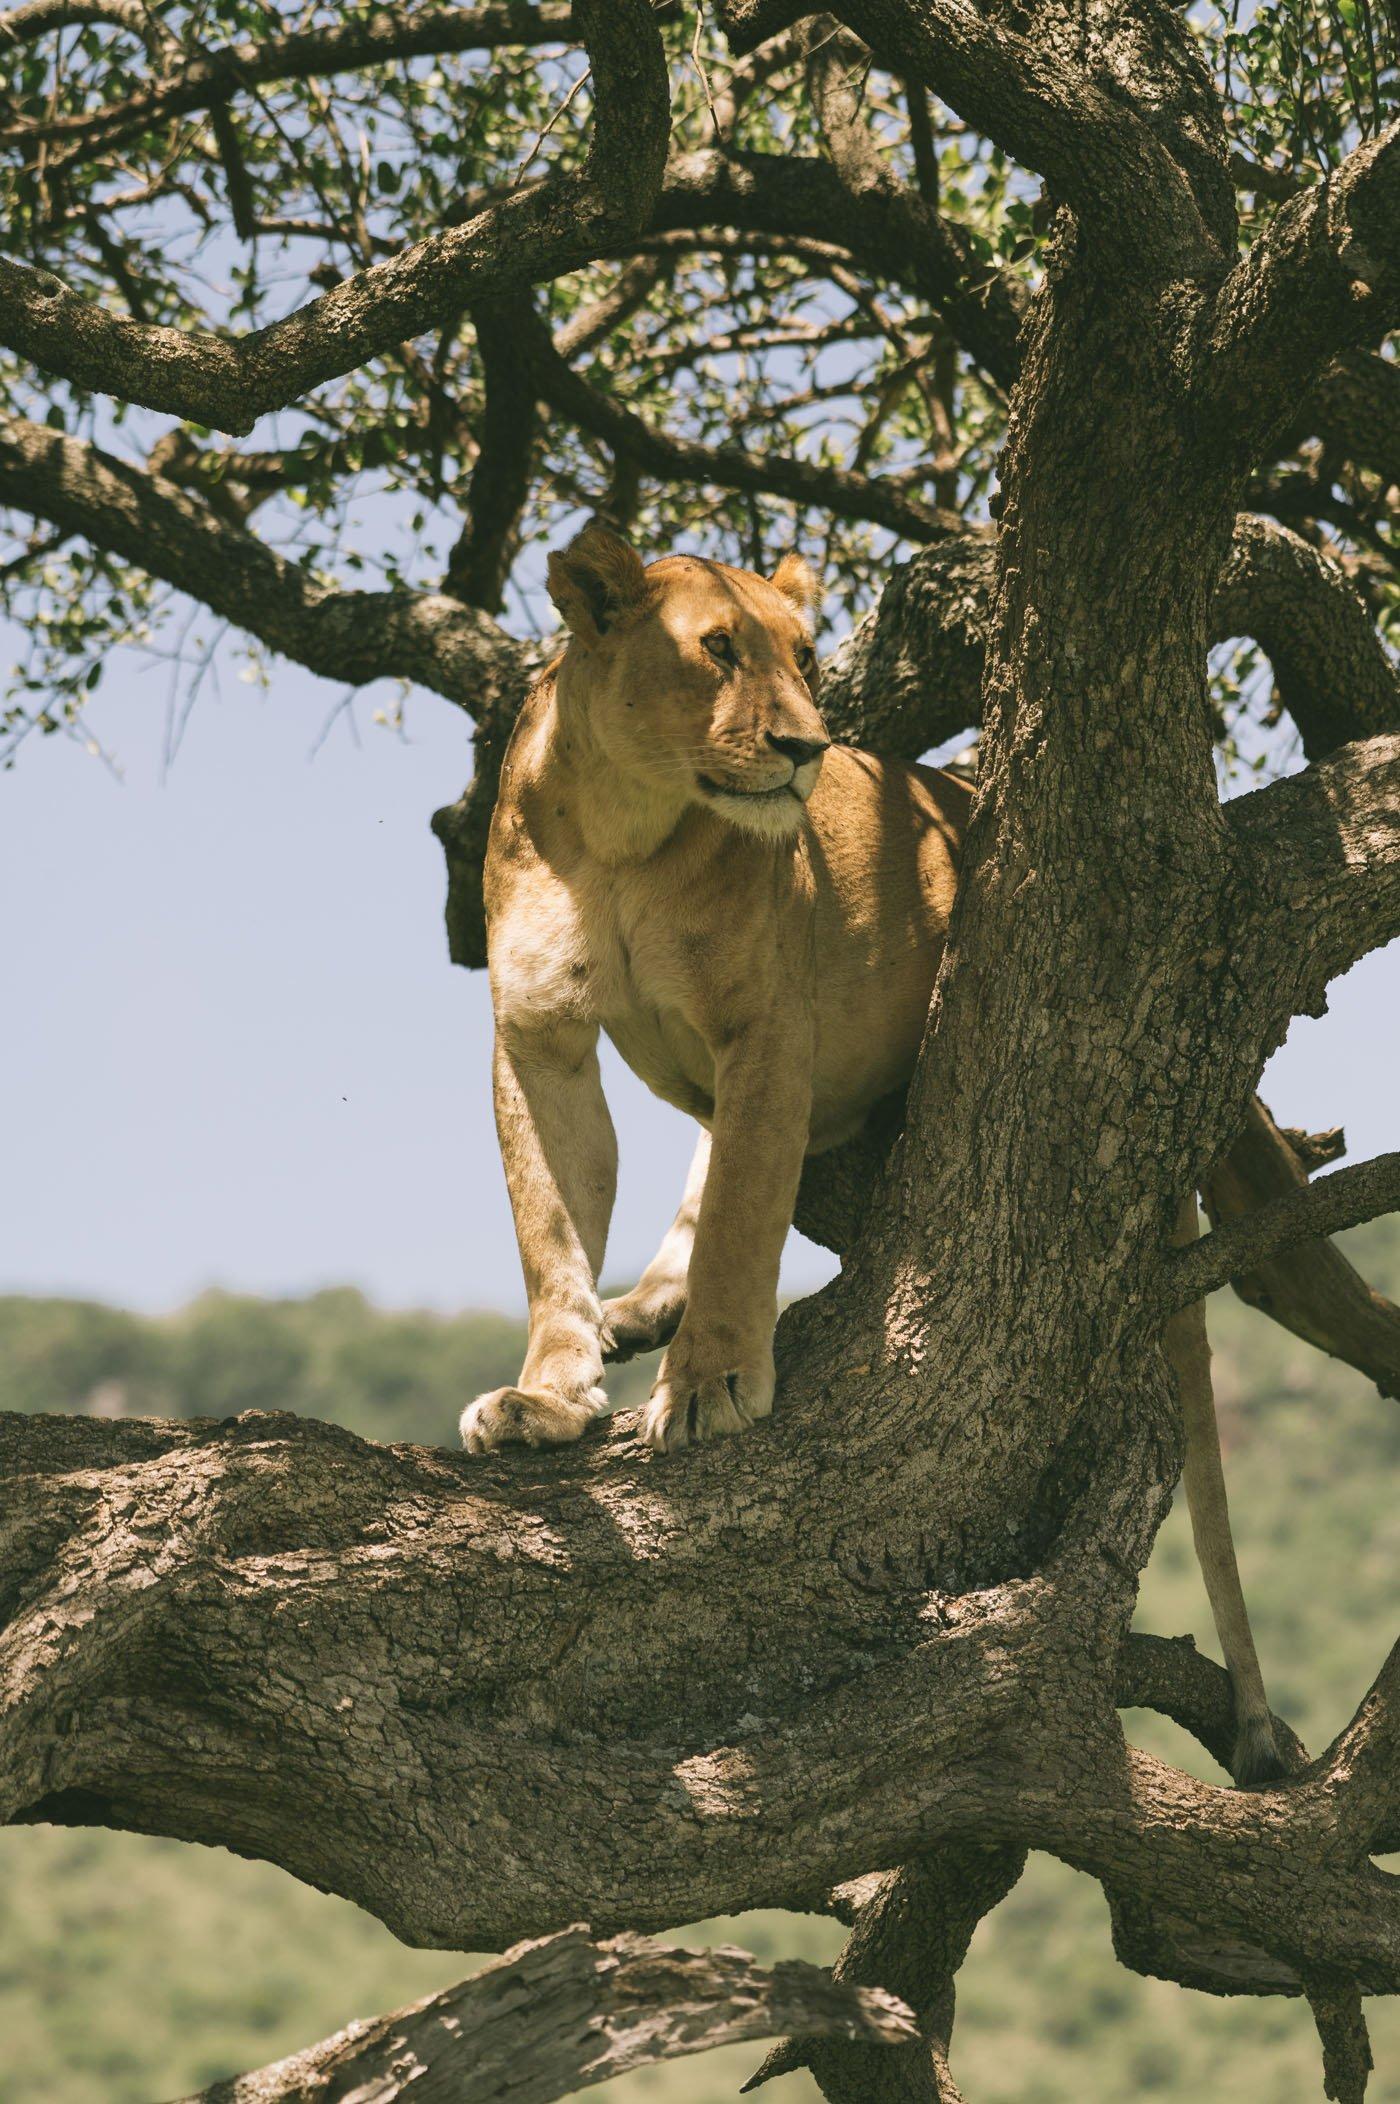 Tree-climbing lions in the Mara Triangle in Kenya